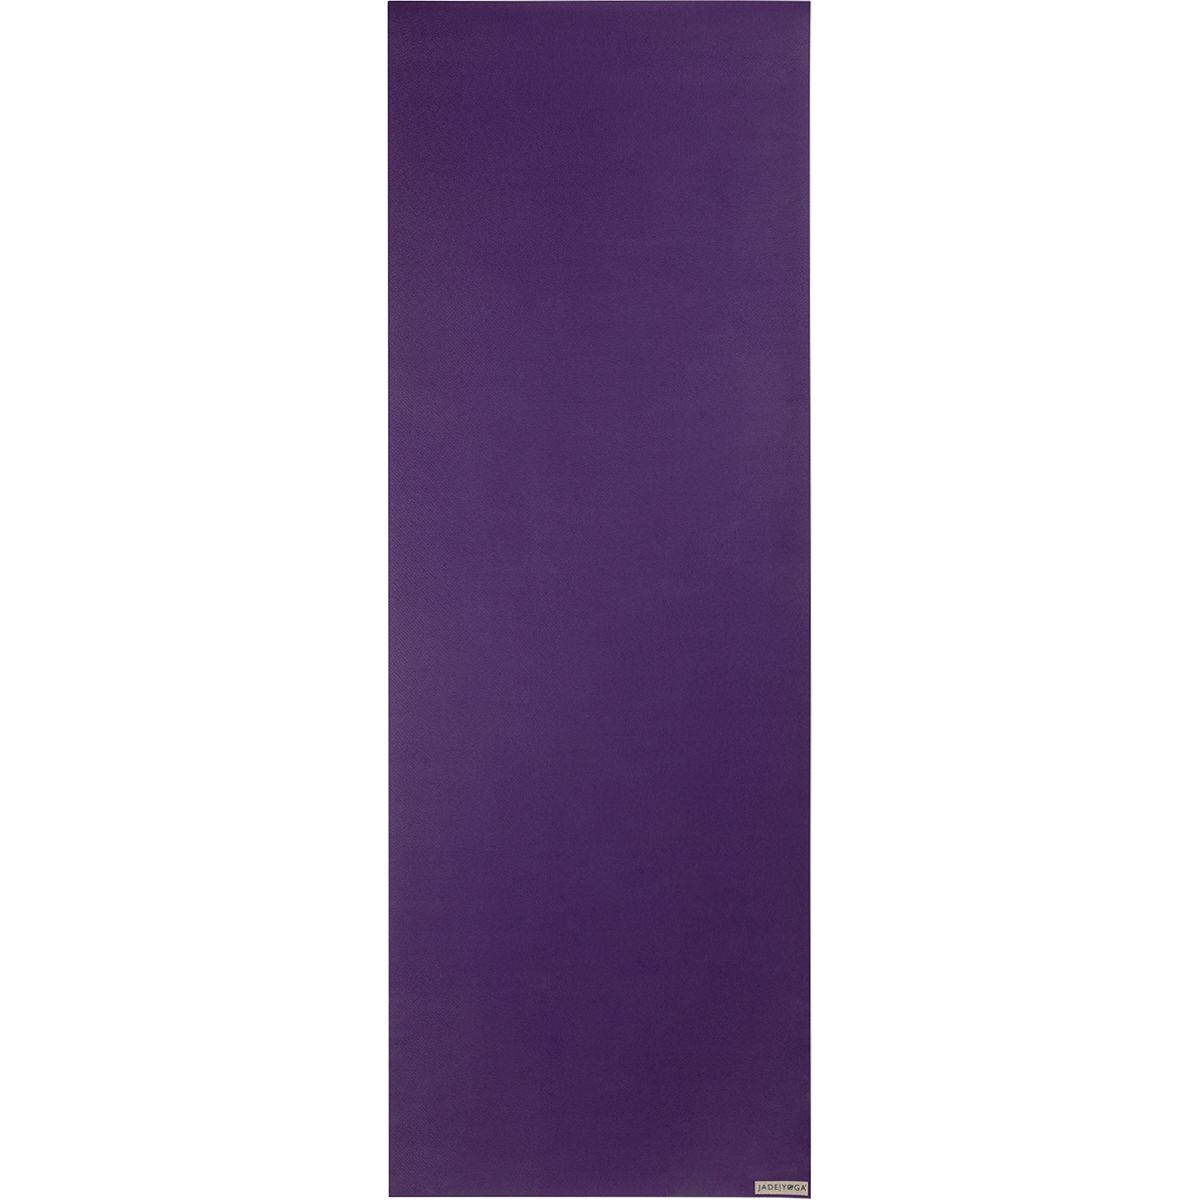 Jade Yoga Harmony Yoga Mat Purple One Size